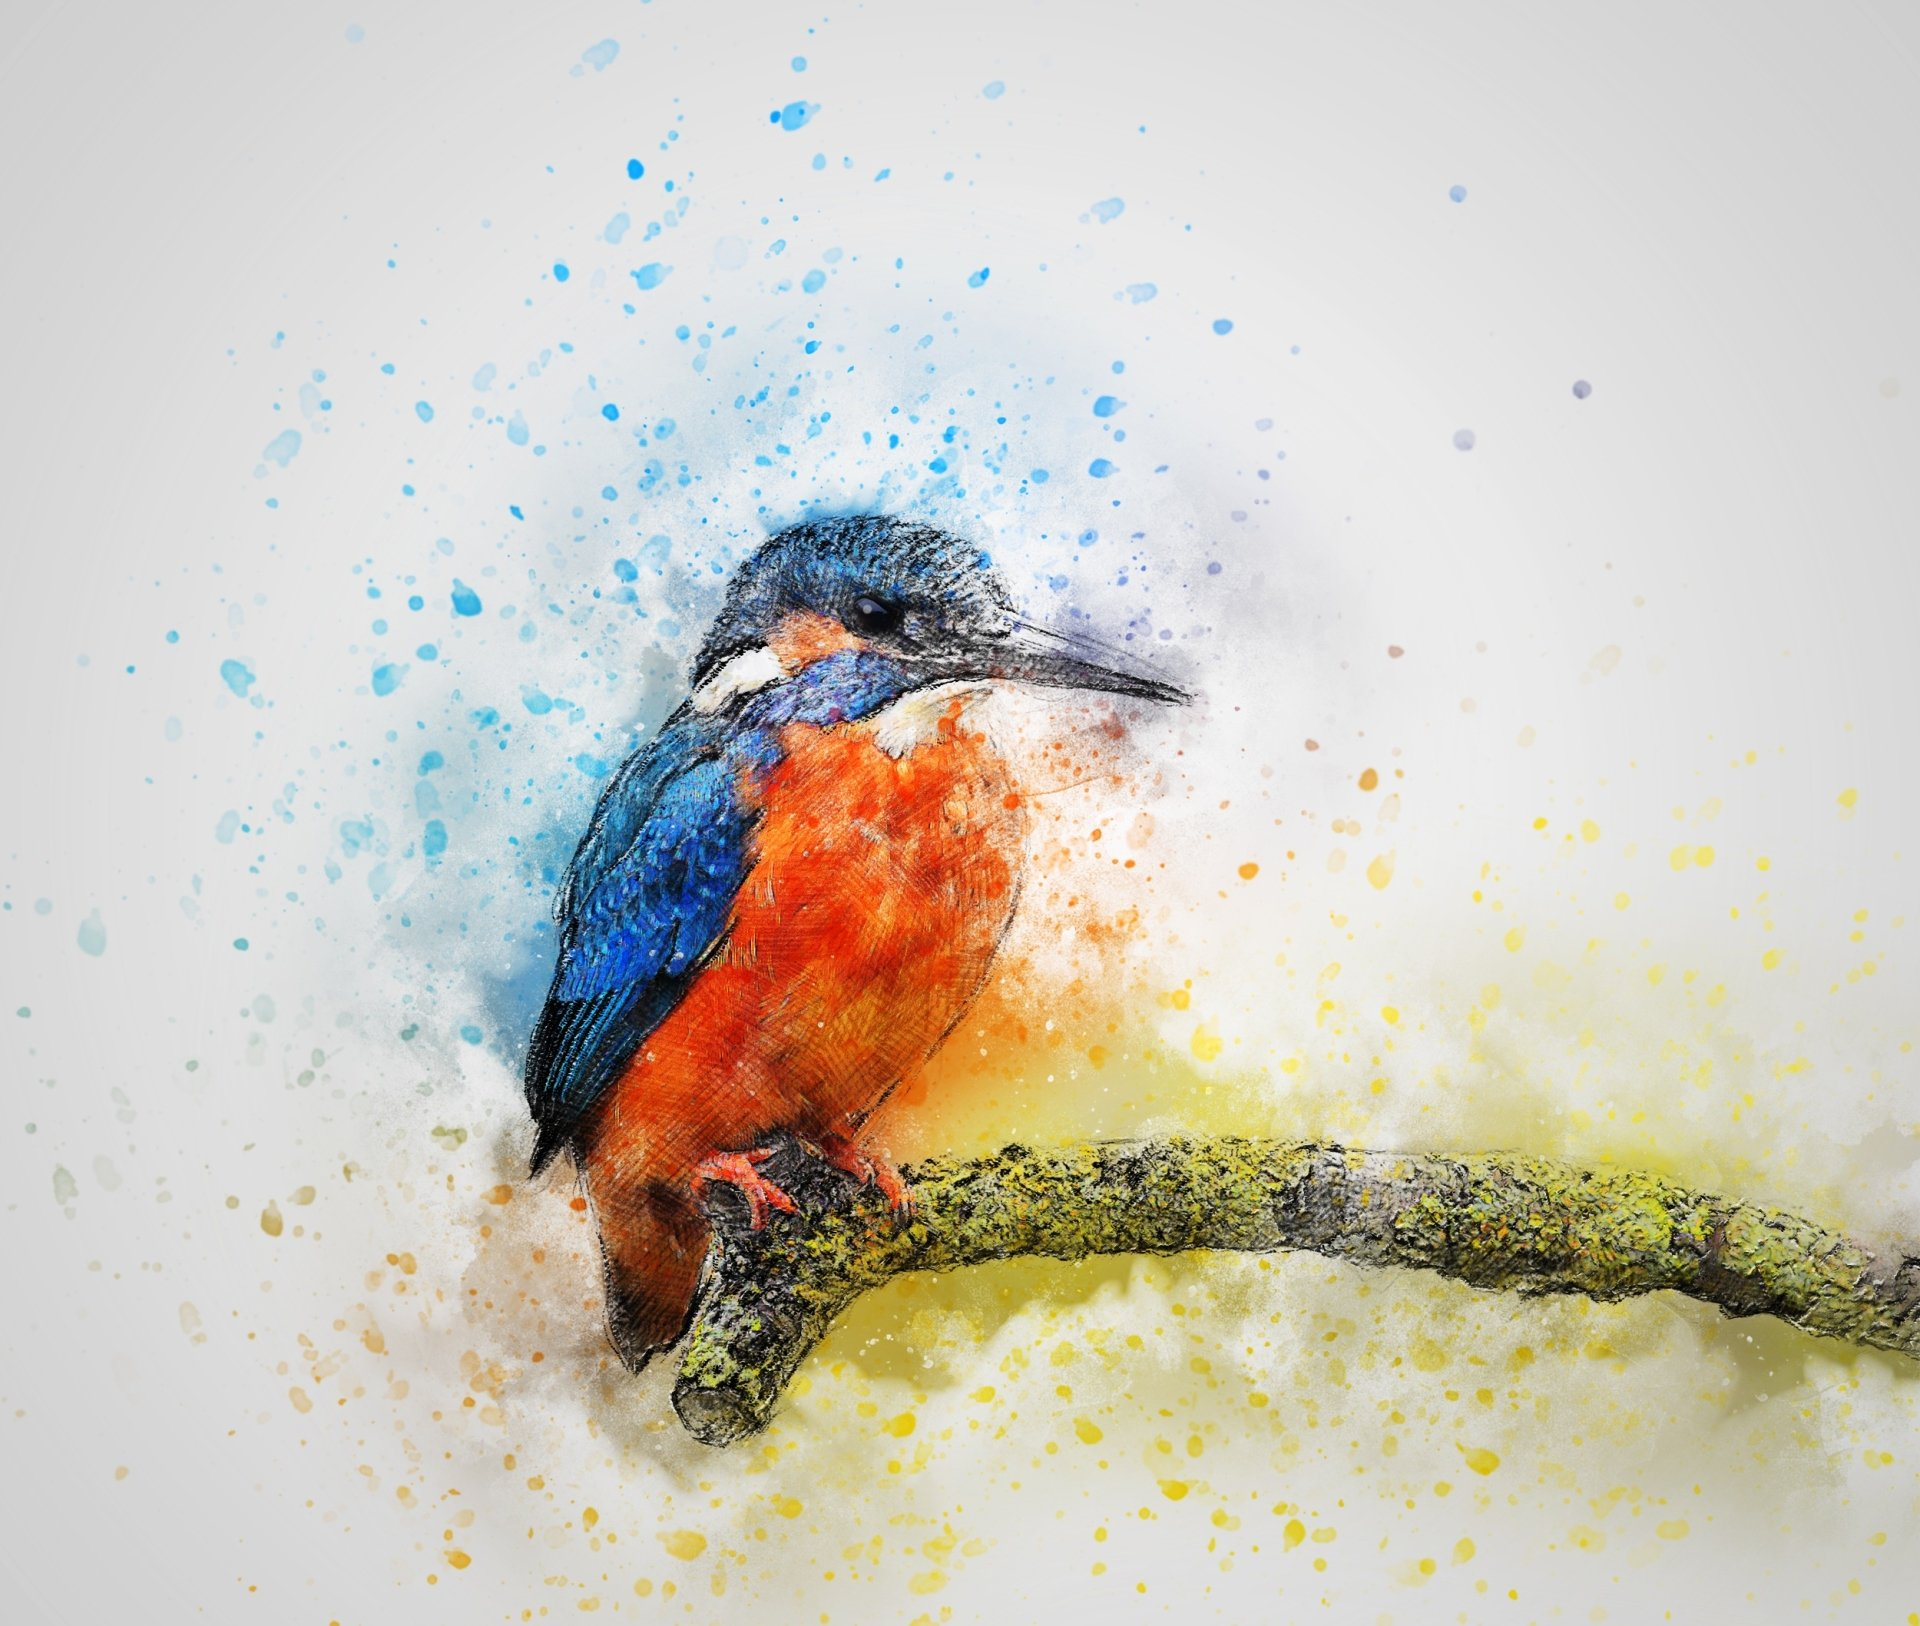 Animal - Kingfisher  Bird Watercolor Artwork Artistic Animal Wallpaper